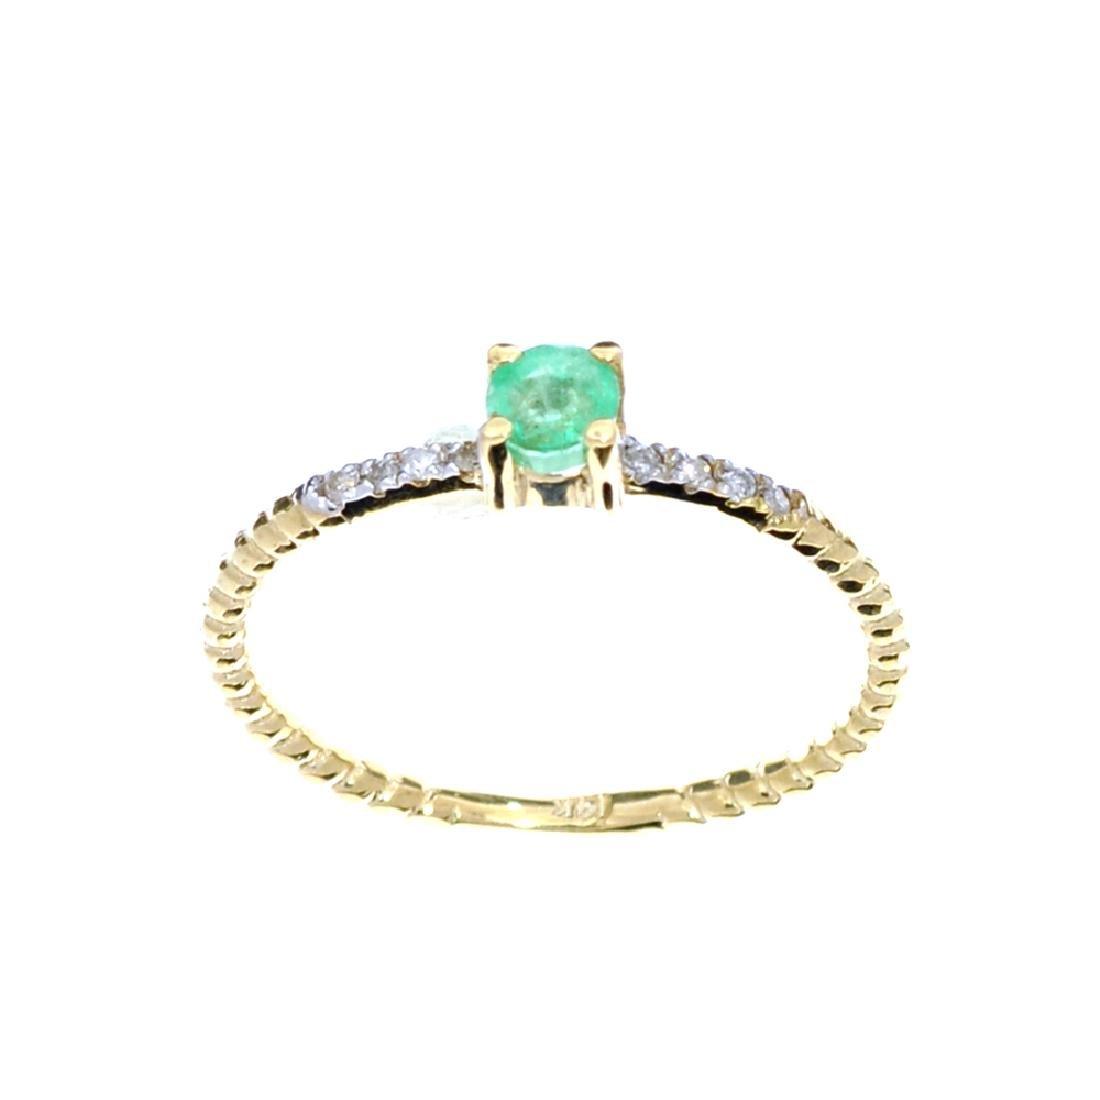 APP: 0.6k Fine Jewelry 14 KT Gold, 0.21CT Round Cut